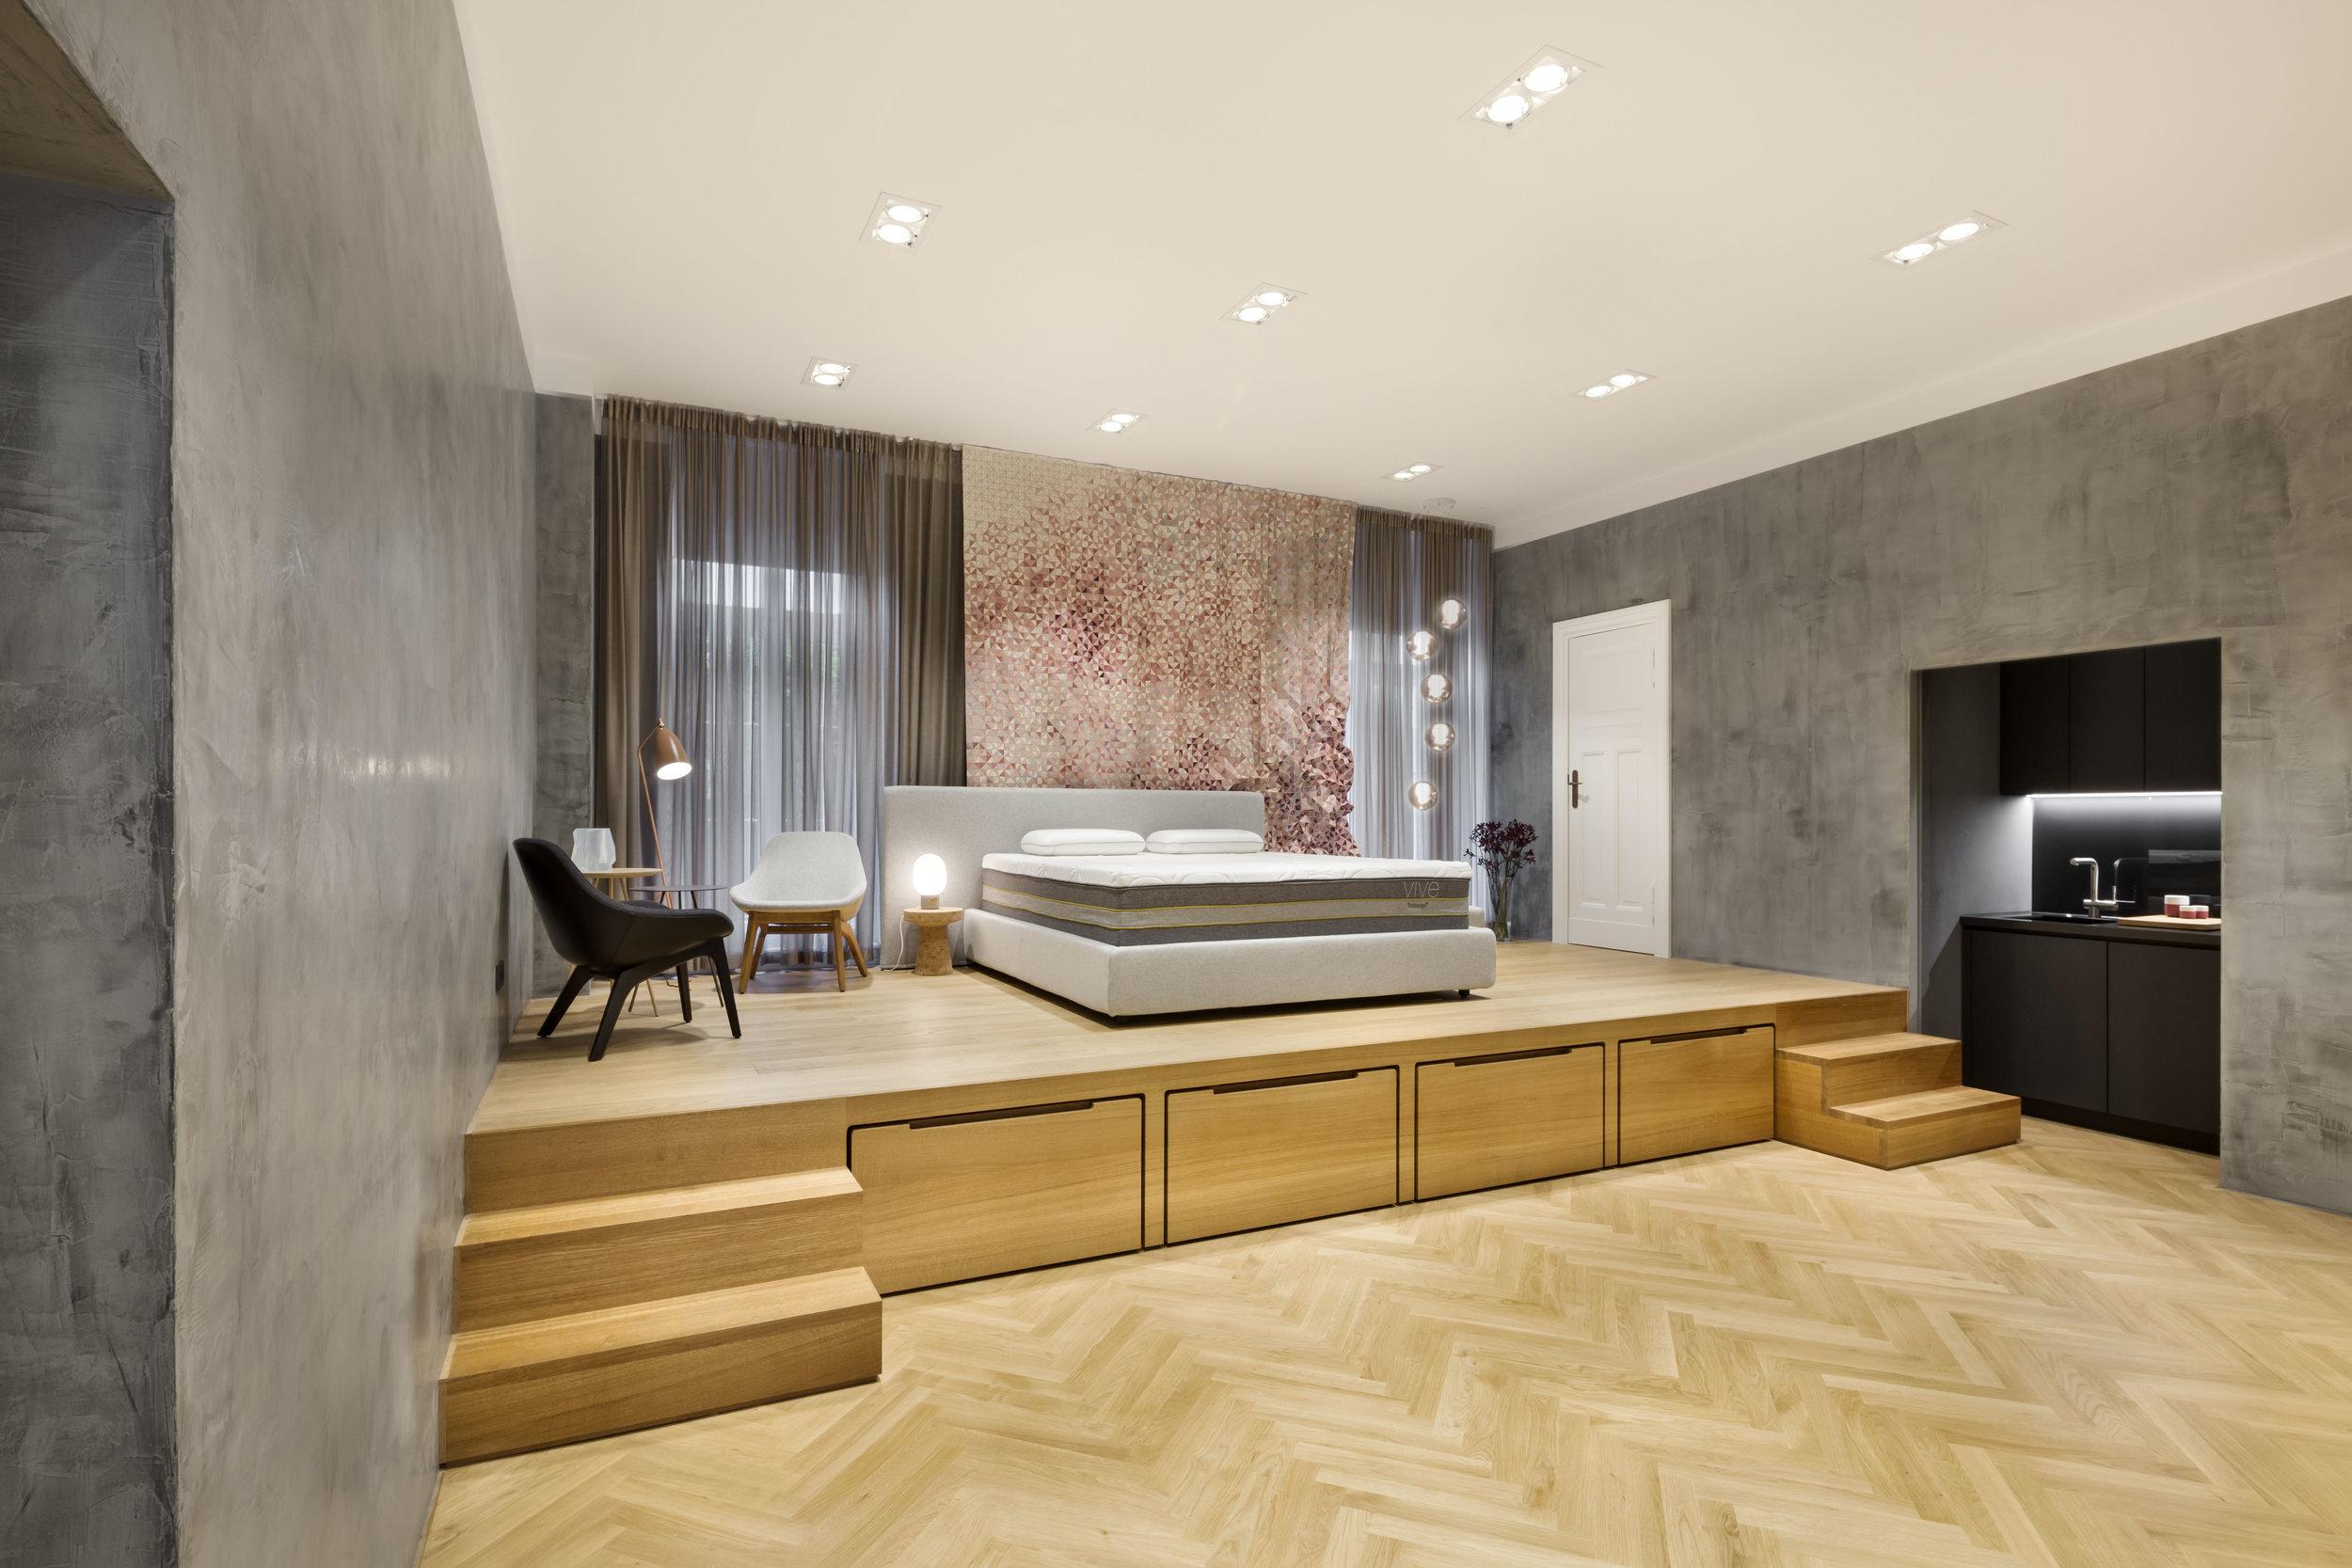 technogel-experience-center_retail-interior-design_coordination-berlin_07.jpg